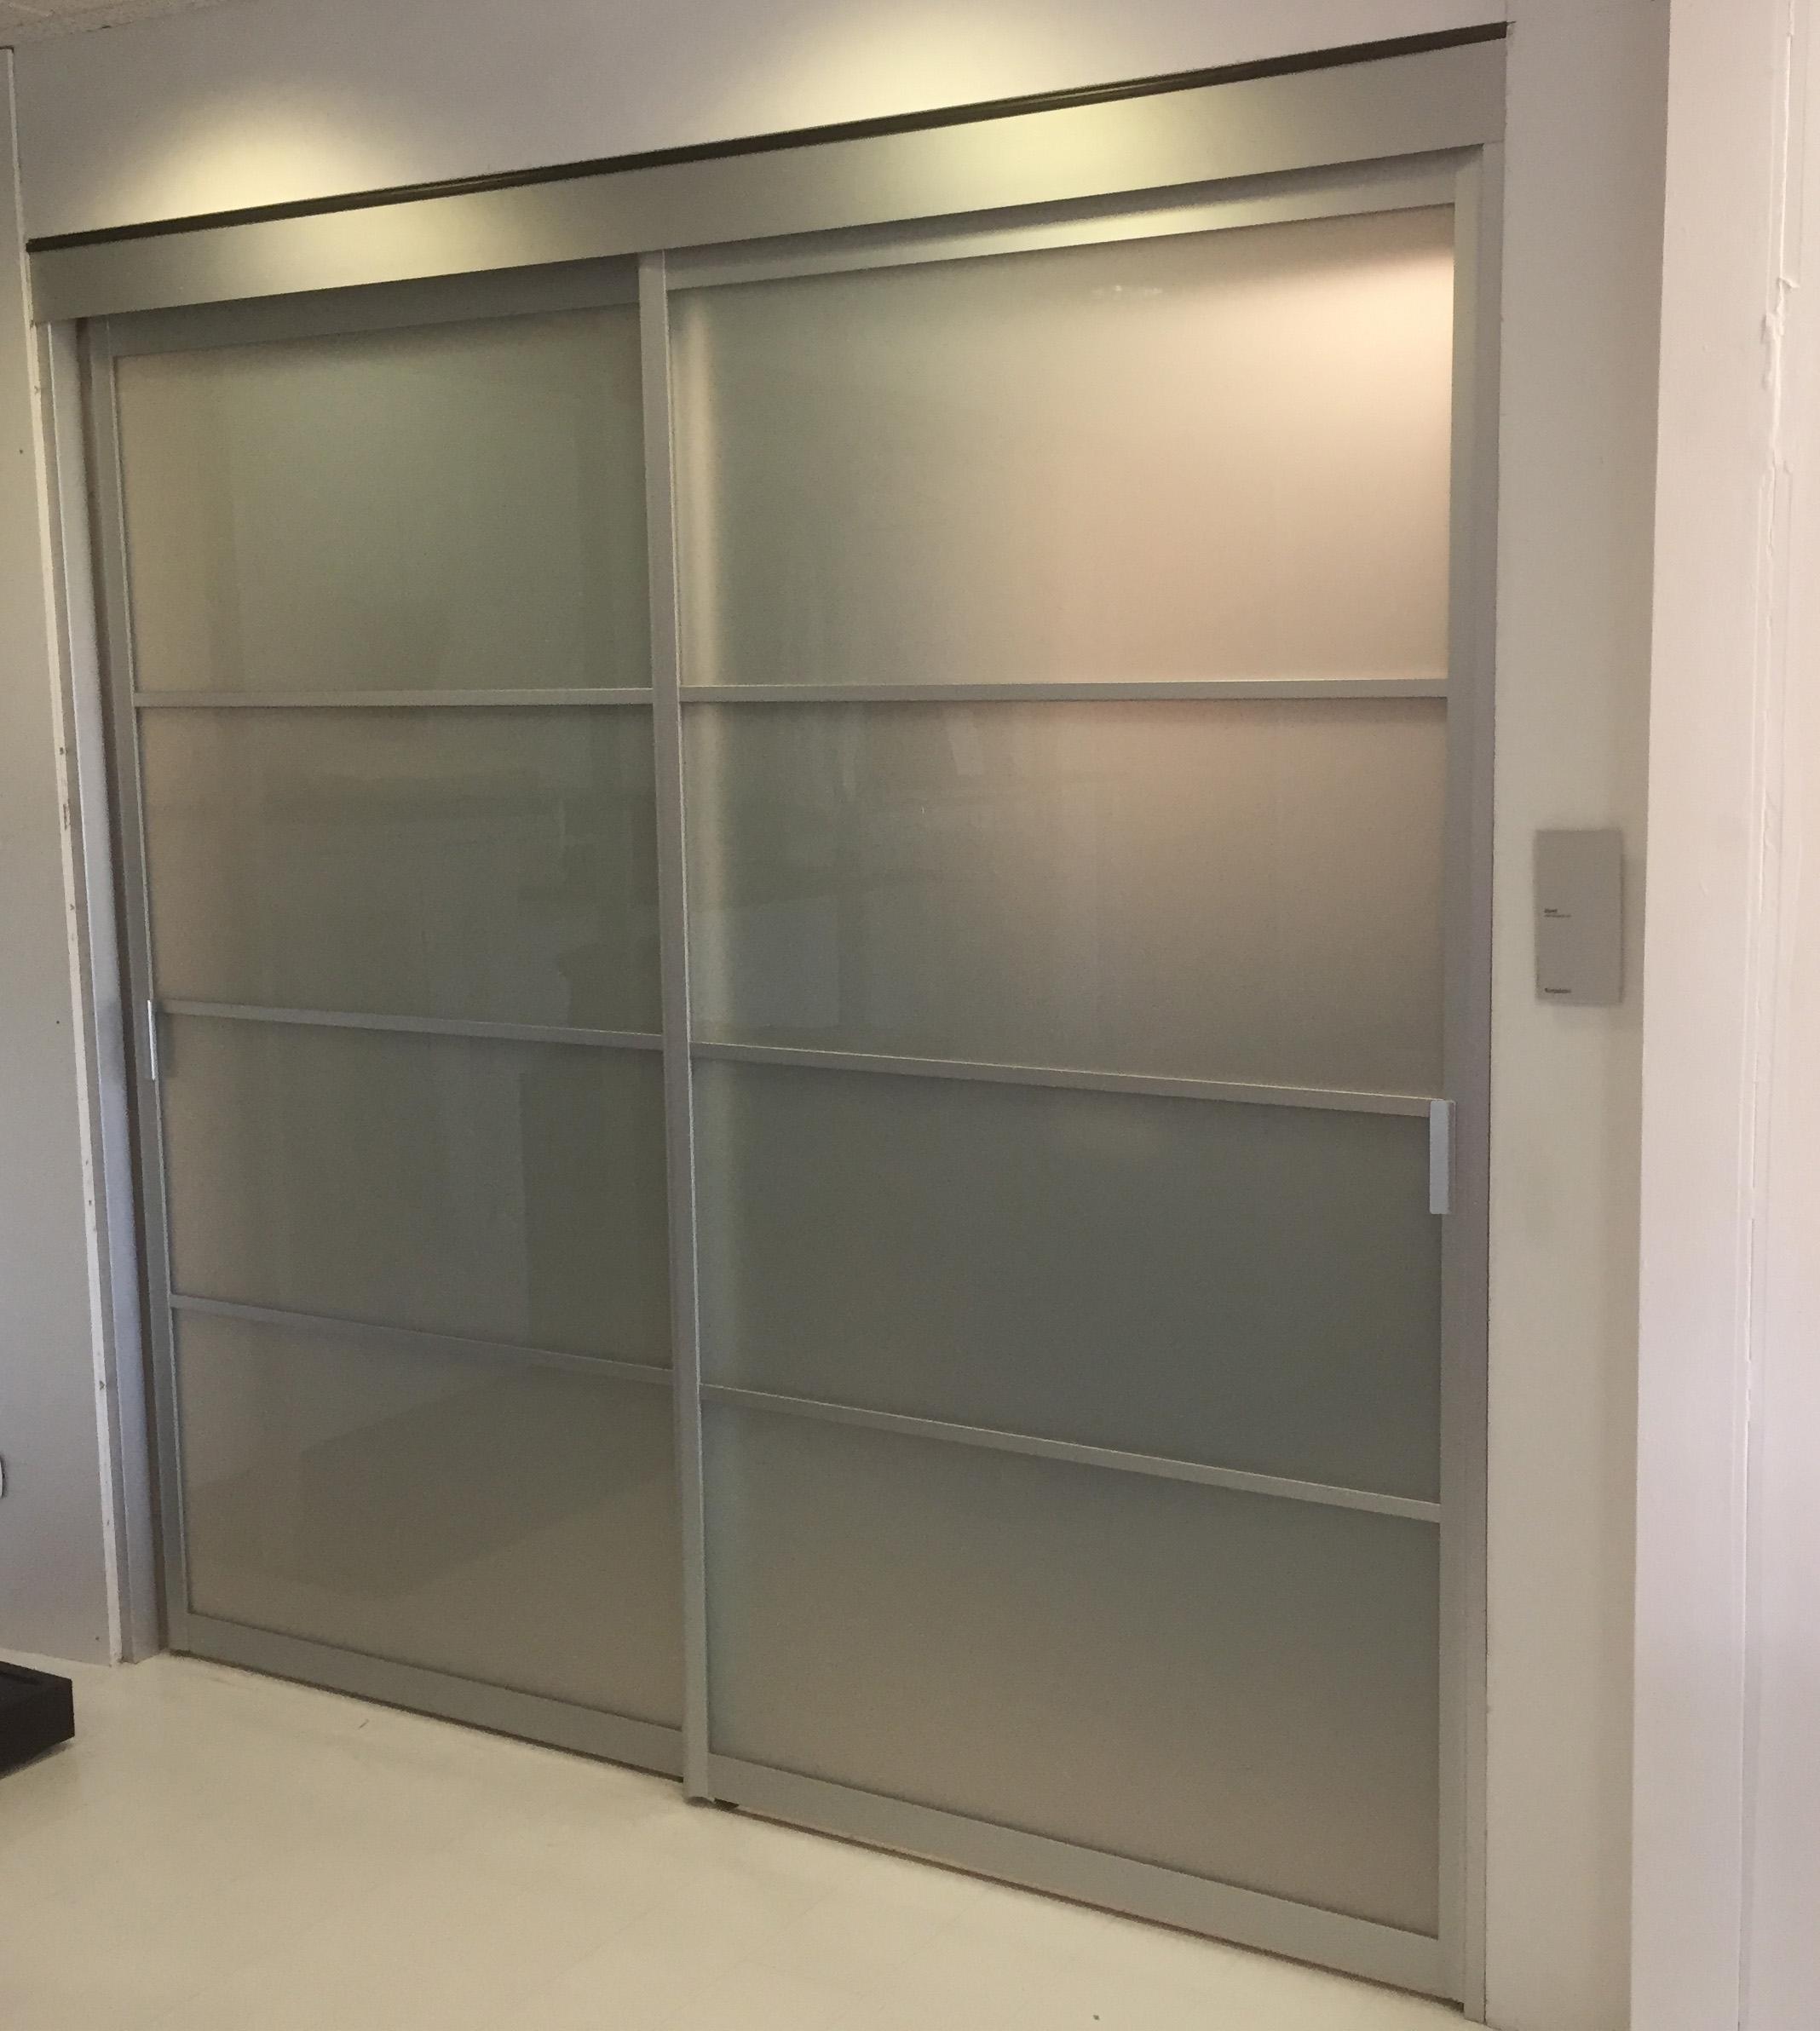 Porta scorrevole rimadesio siparium in vetro acidato - Porta in vetro scorrevole ...